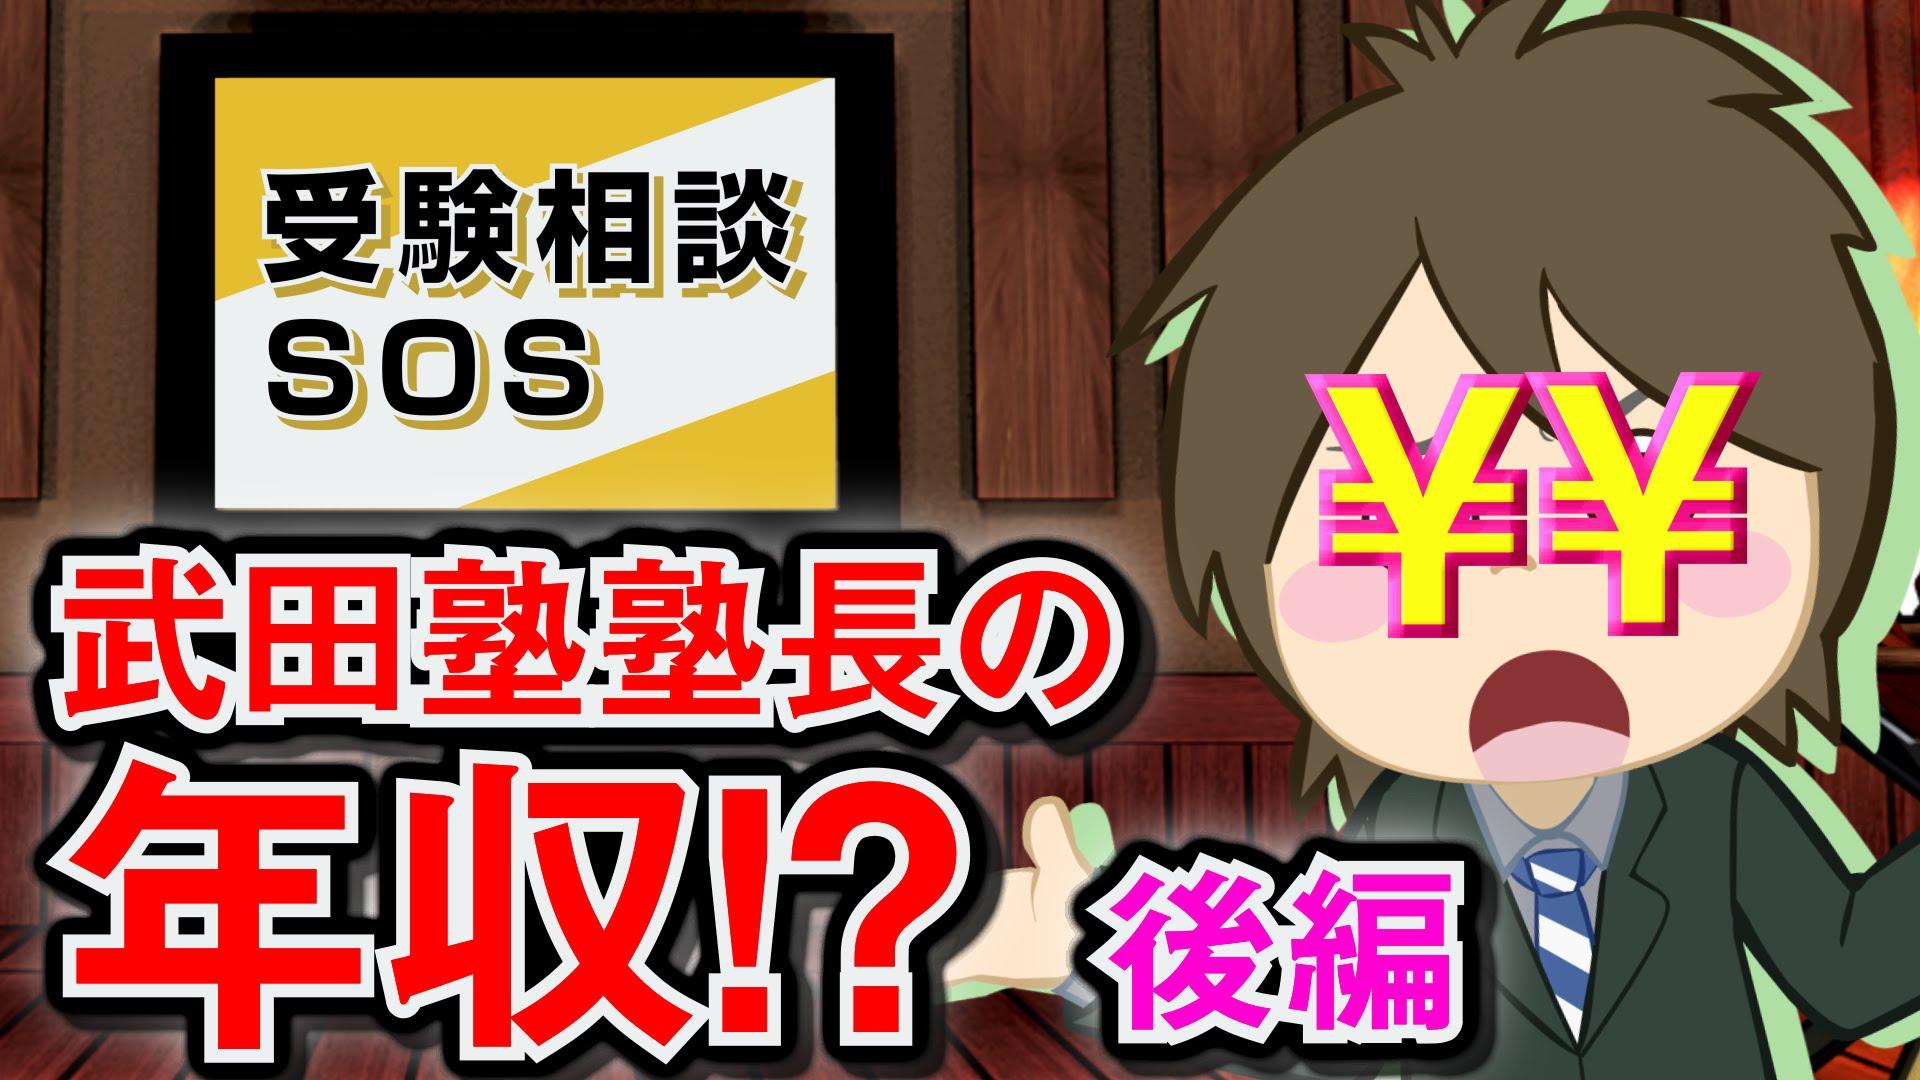 【vol.41】塾長の年収公開(後編)!?|受験相談SOS